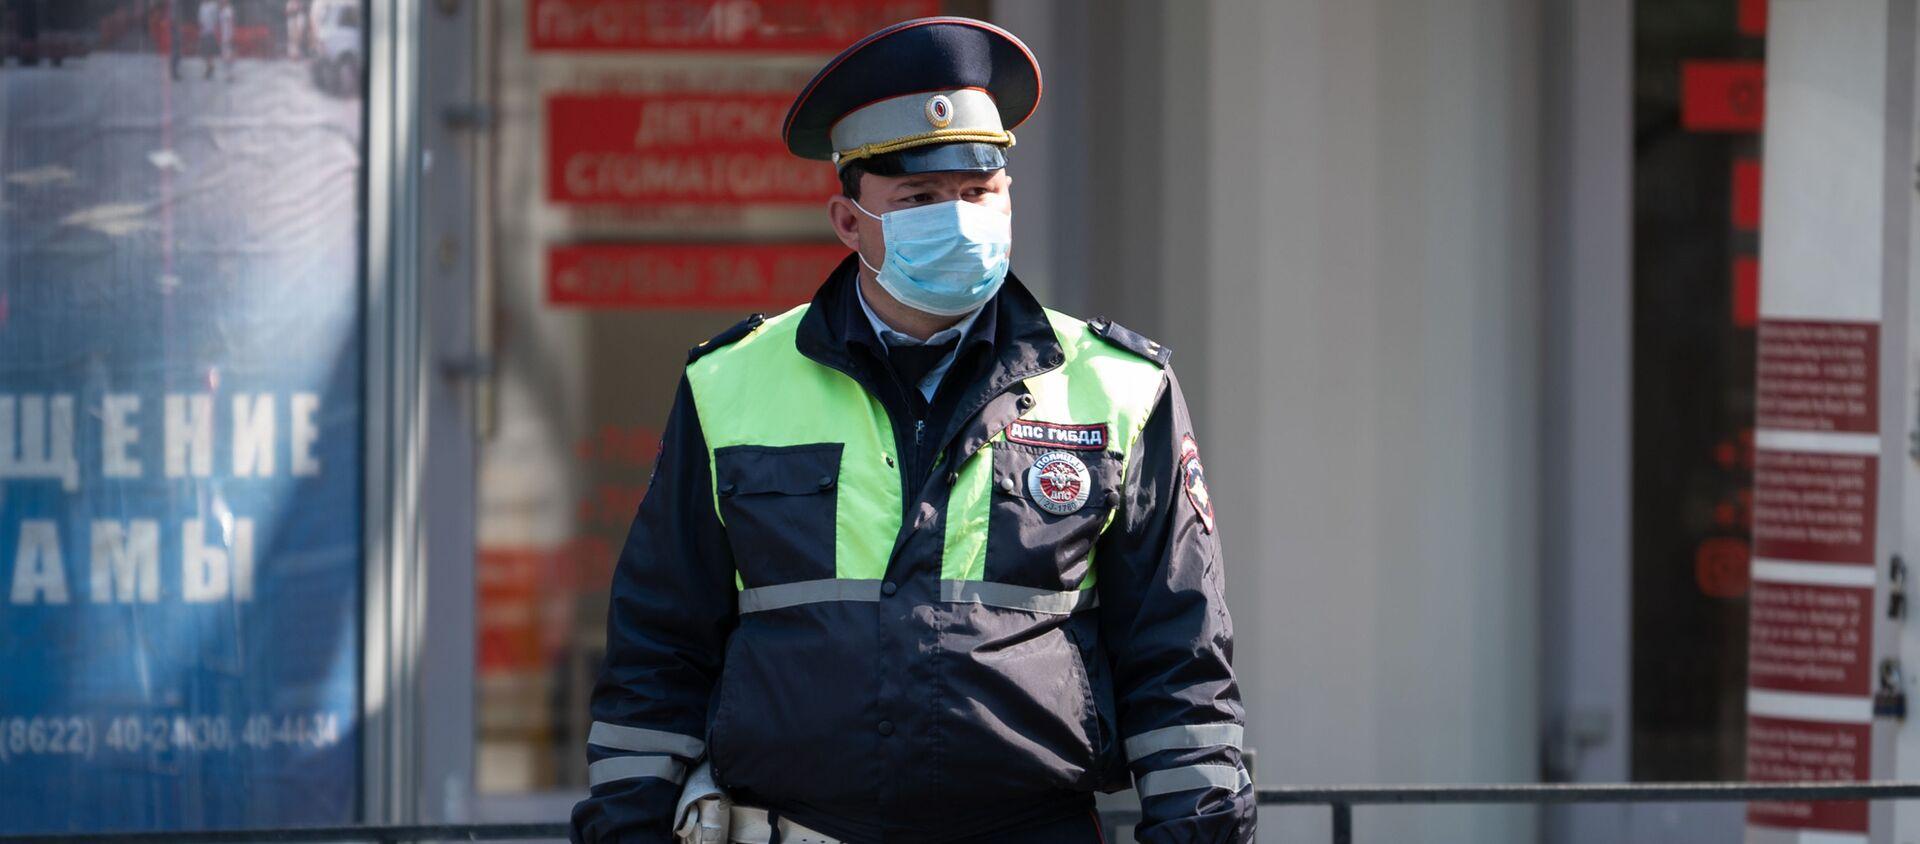 Сотрудник ДПС ГИБДД в защитной маске - Sputnik Таджикистан, 1920, 09.02.2021